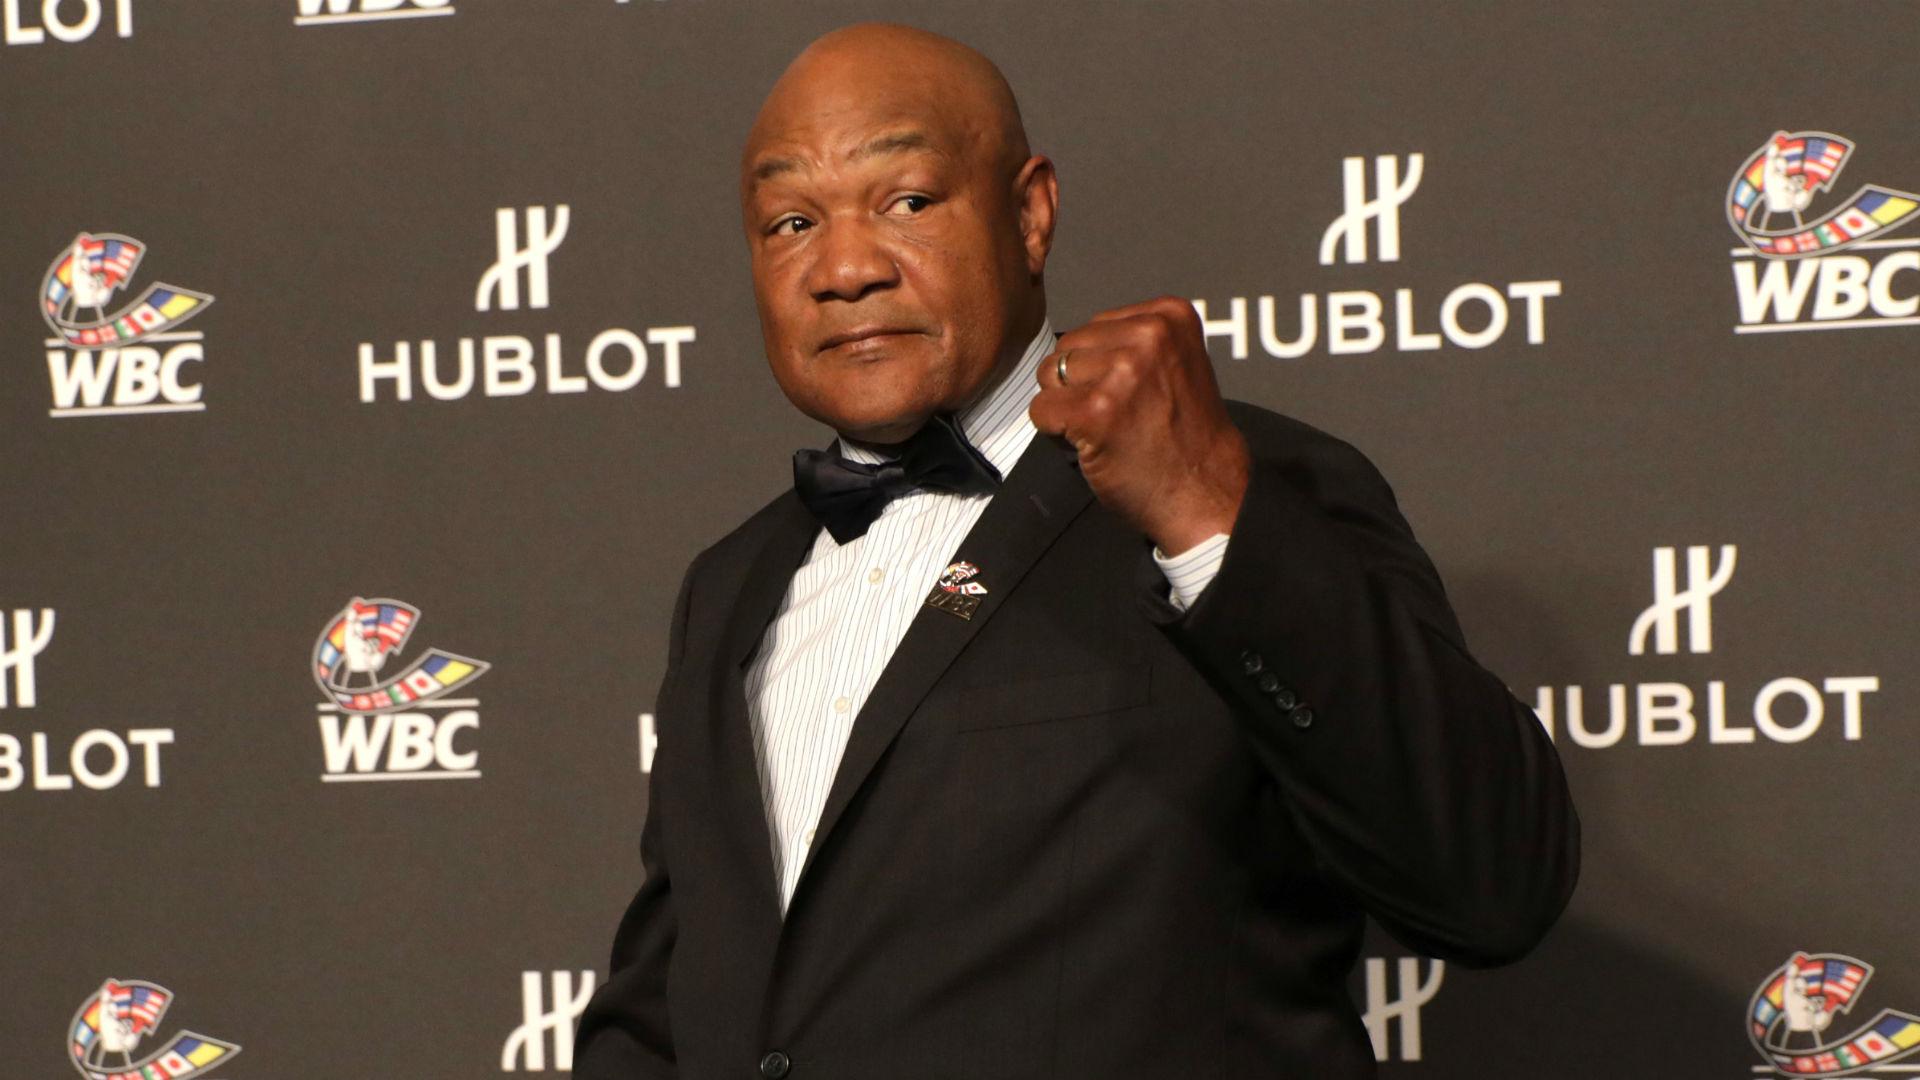 Mike Tyson comeback vs. Roy Jones Jr. 'a beautiful thing' despite risks, says George Foreman 1